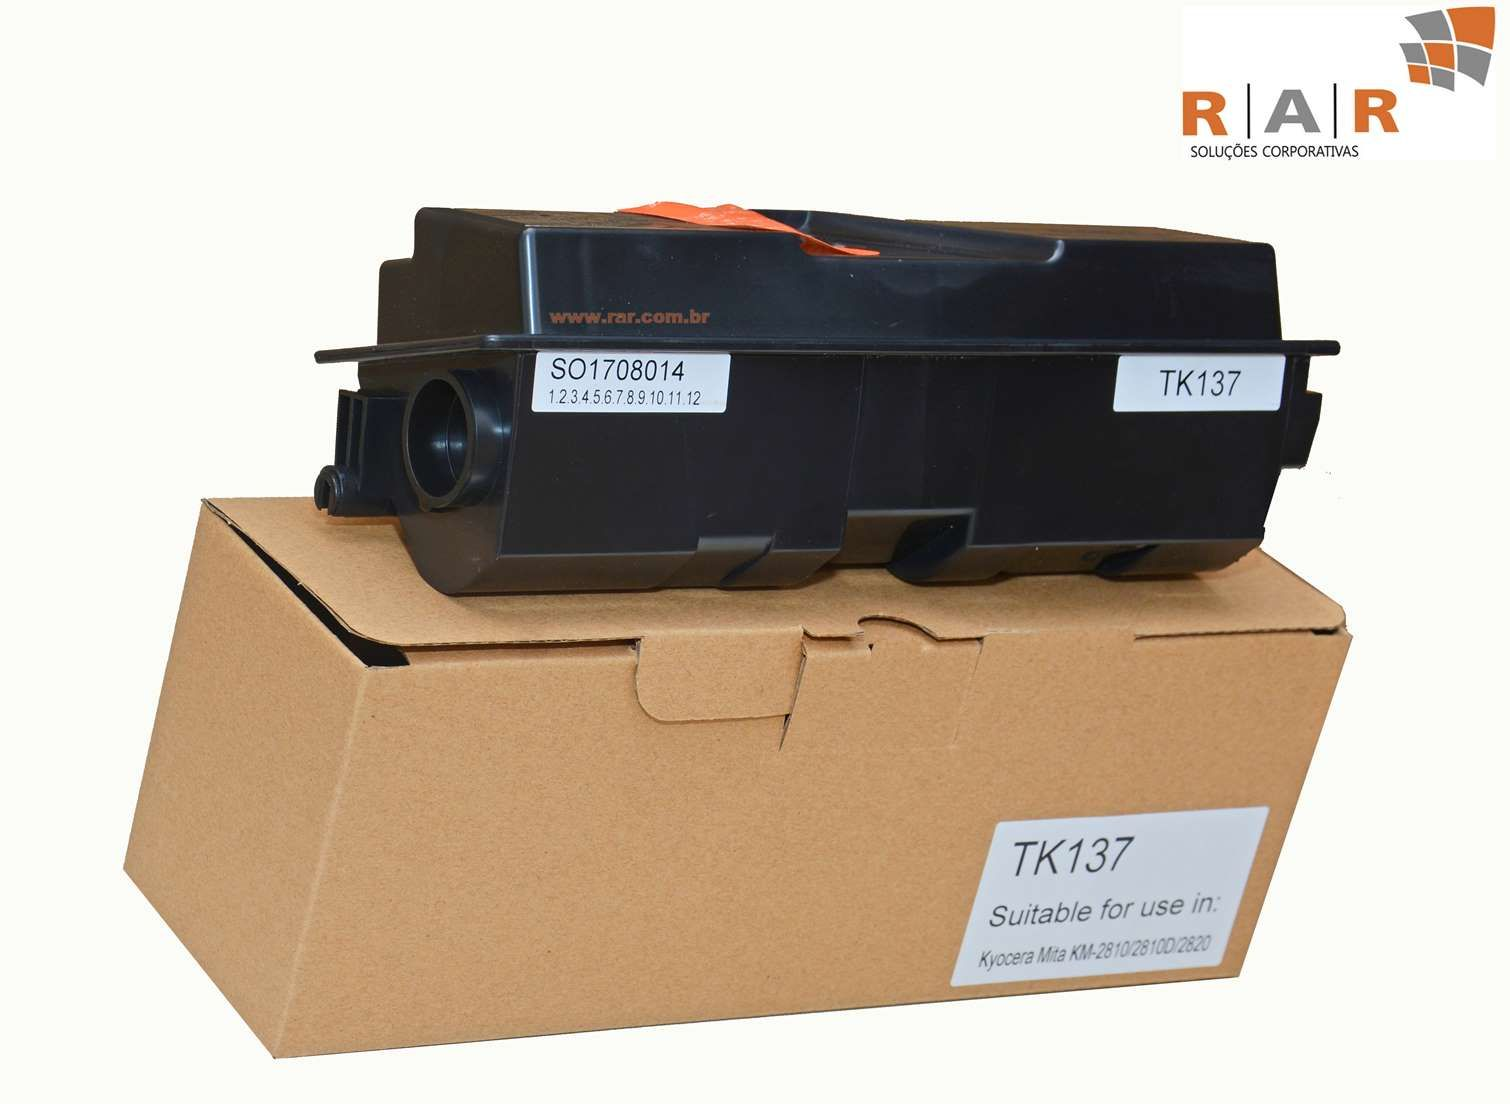 TK137 (TK-137) CARTUCHO DE TONER COMPATIVEL NOVO PARA KYOCERA KM-2810 / KM-2820